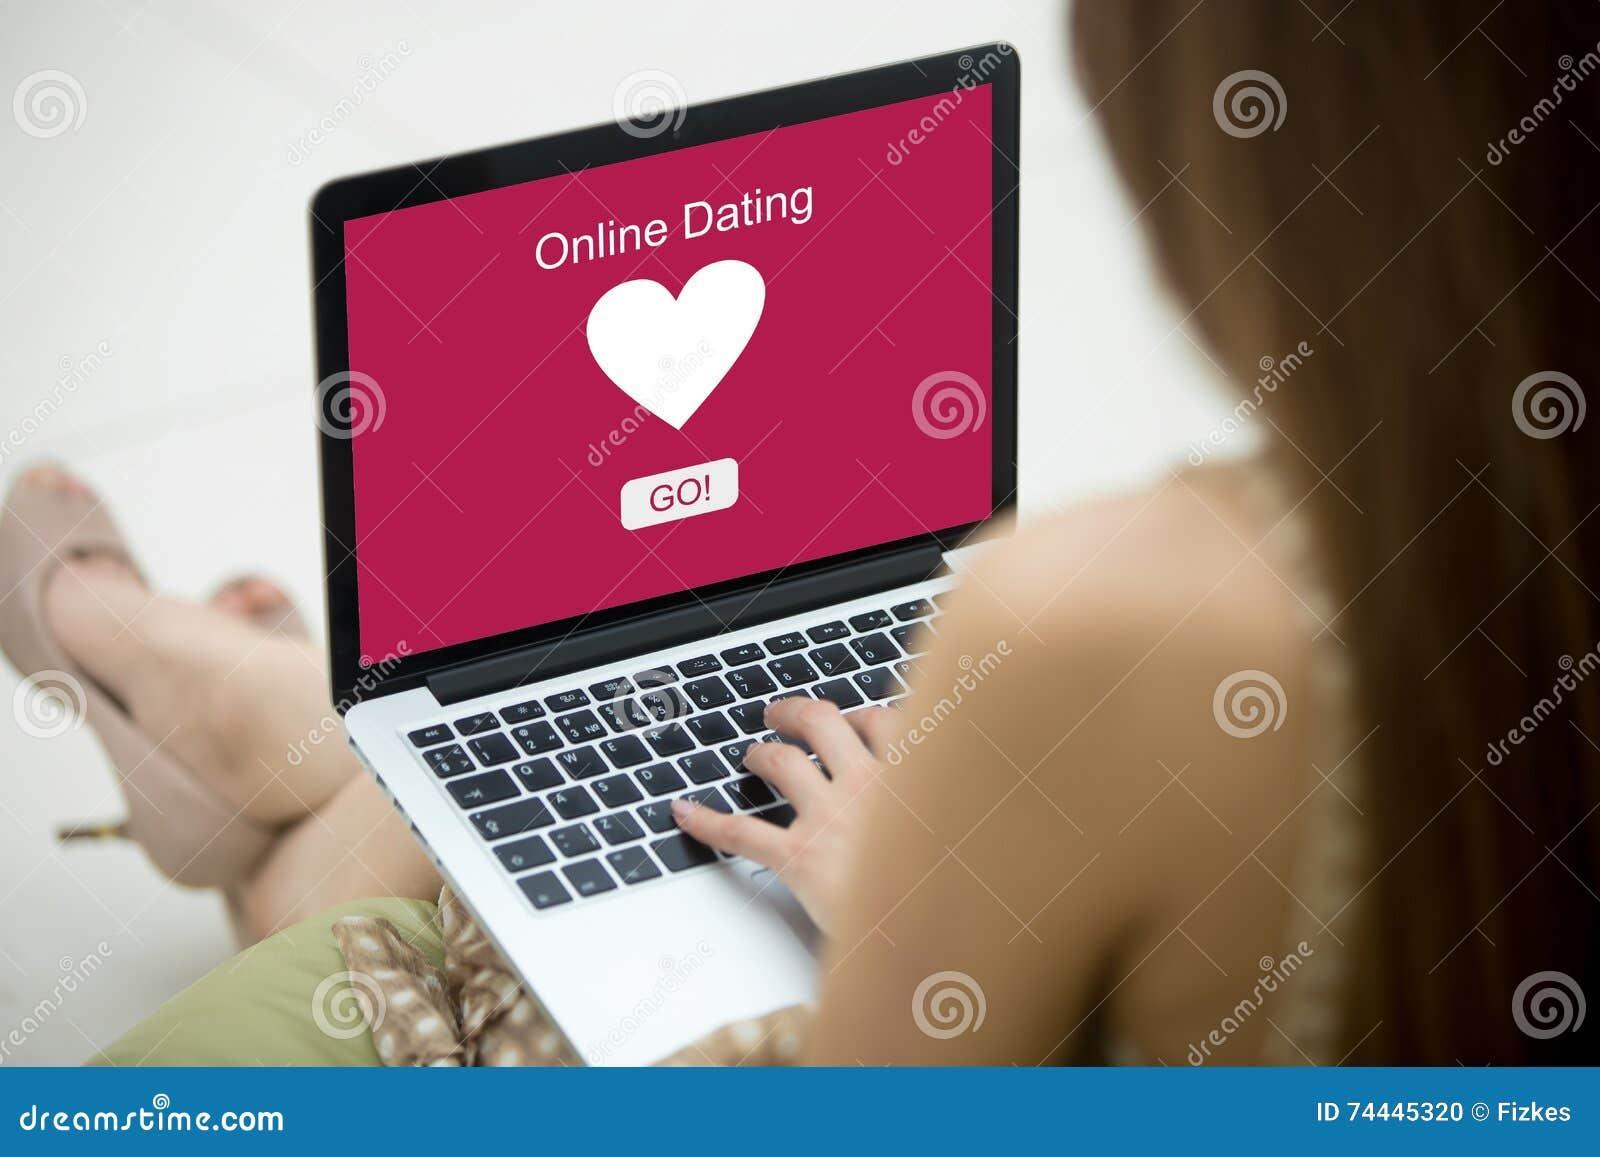 belle datation en ligne